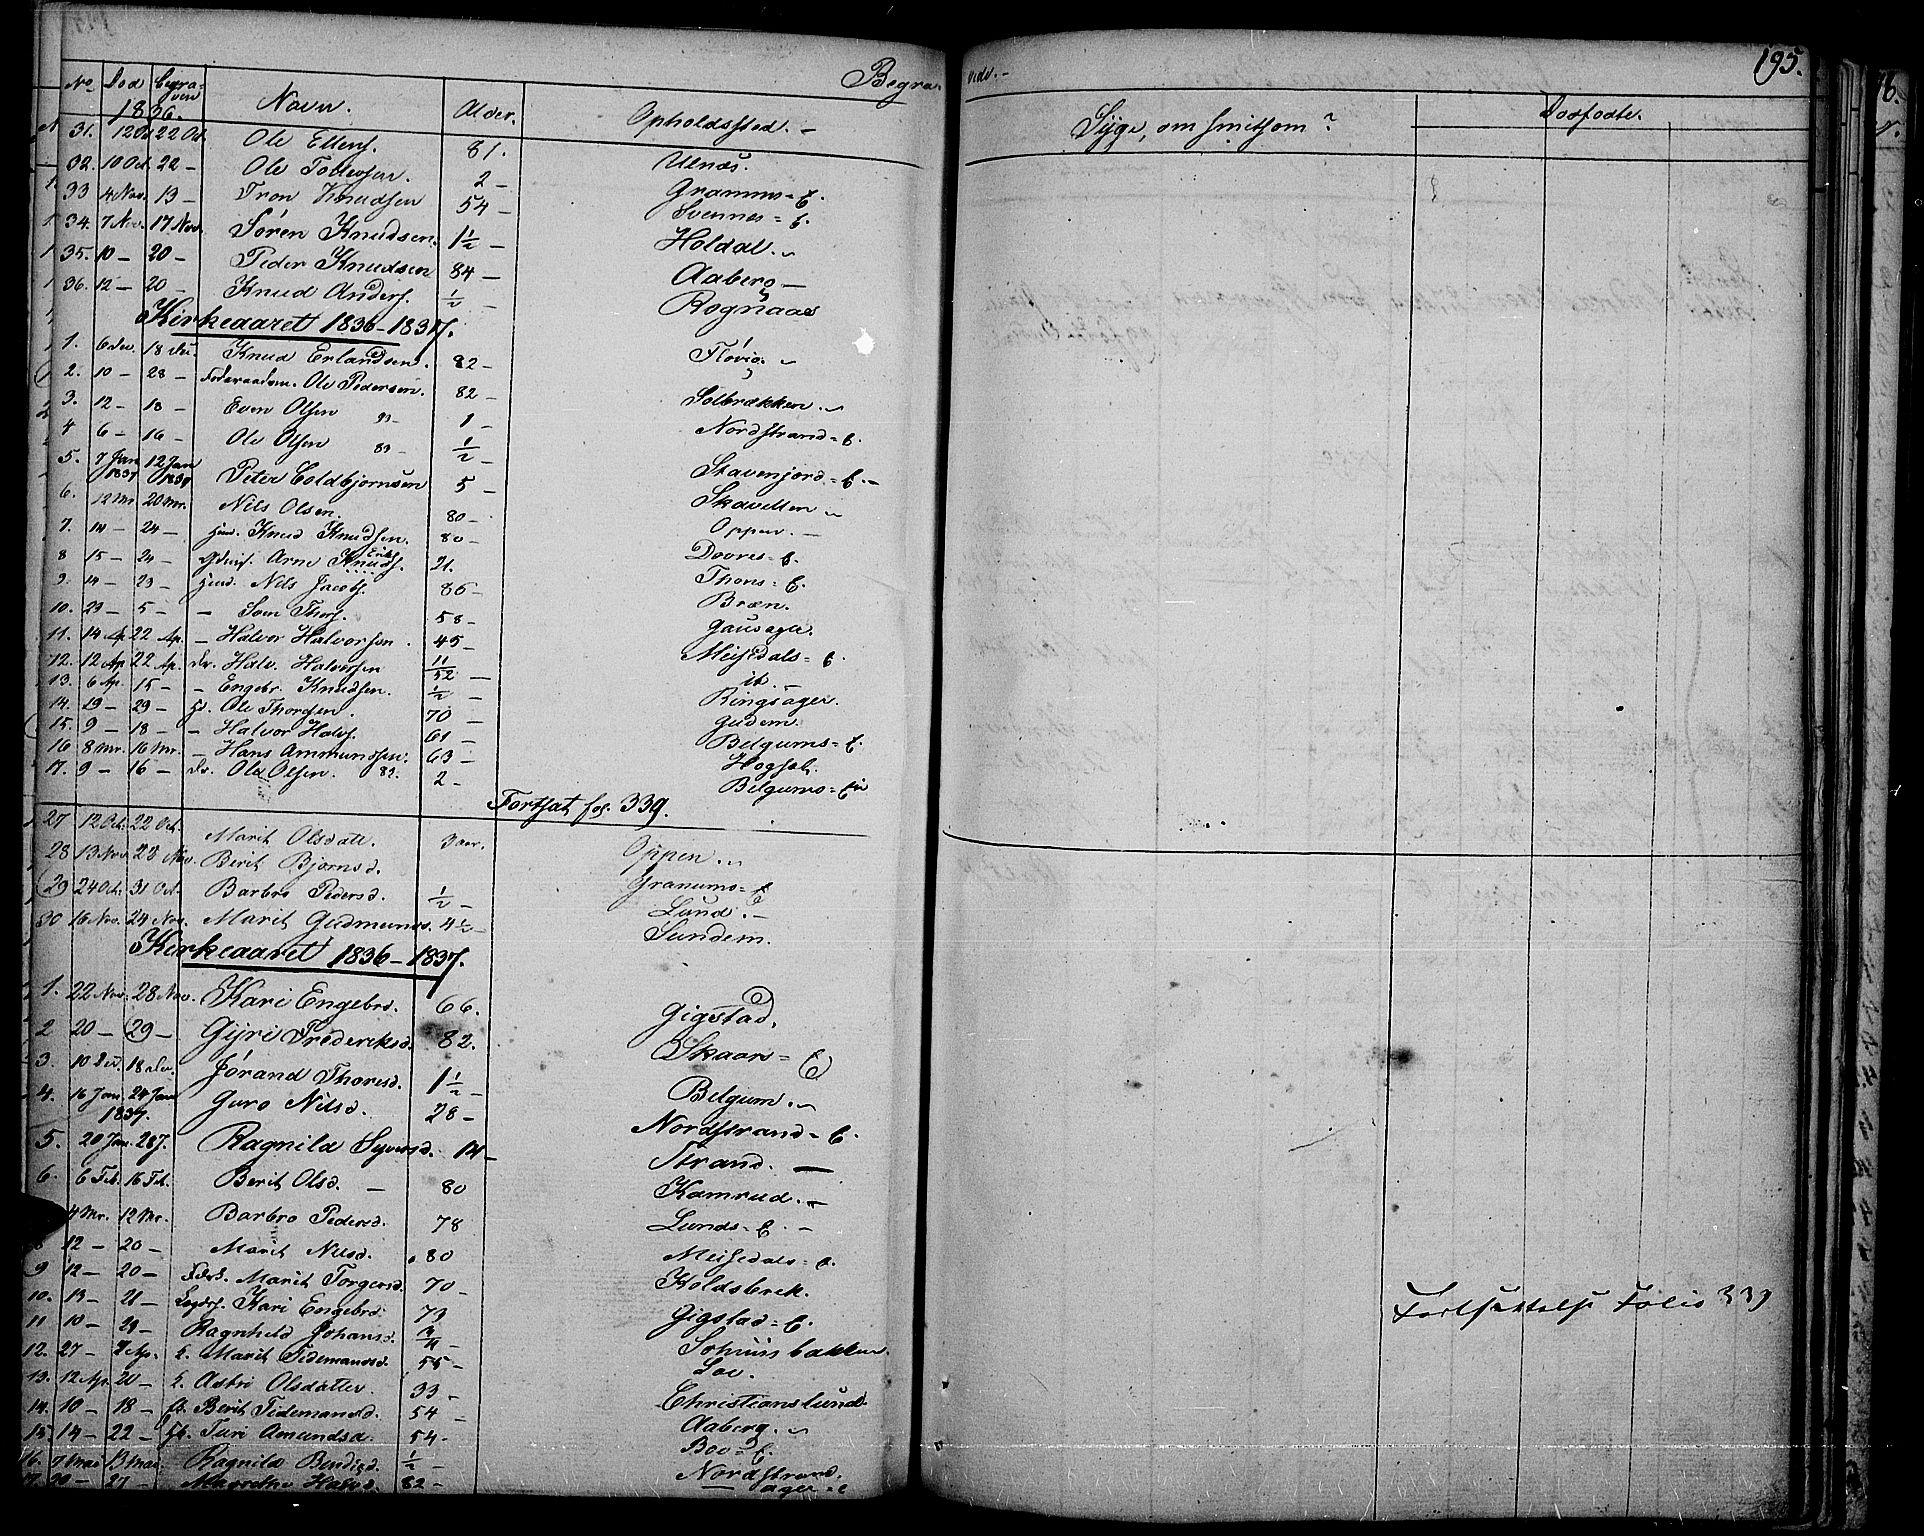 SAH, Nord-Aurdal prestekontor, Ministerialbok nr. 3, 1828-1841, s. 195